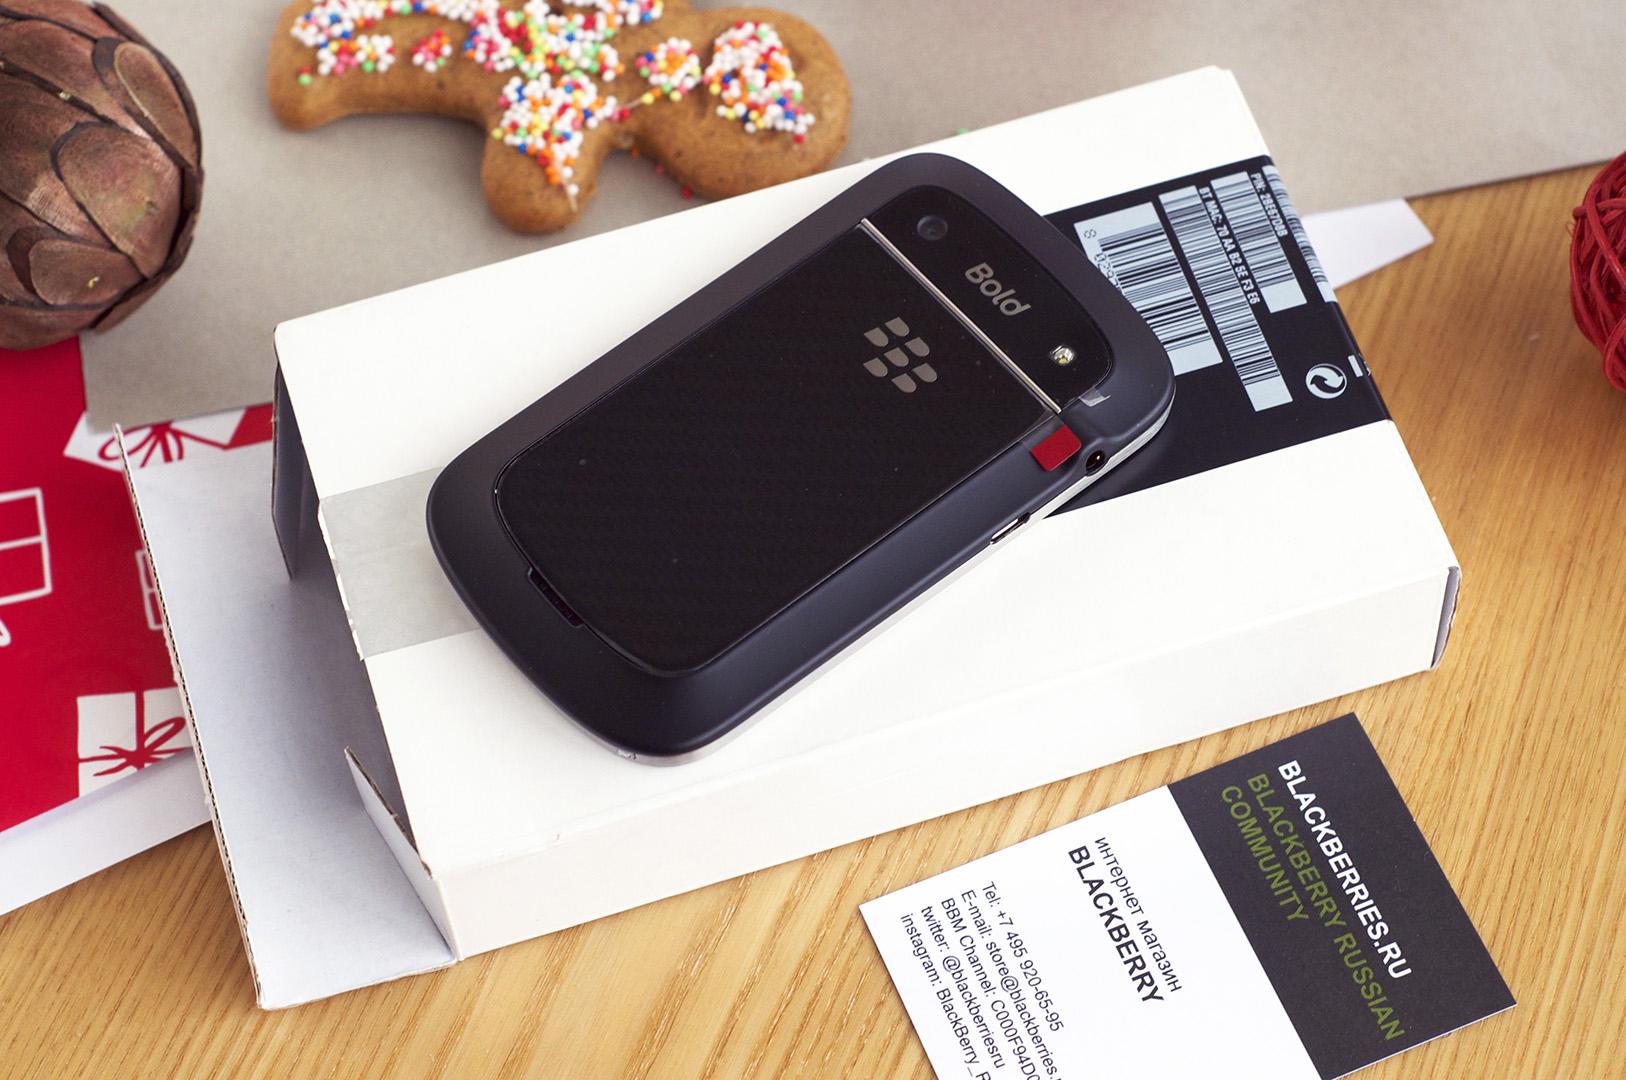 blackberry-9900-bold-2014-3